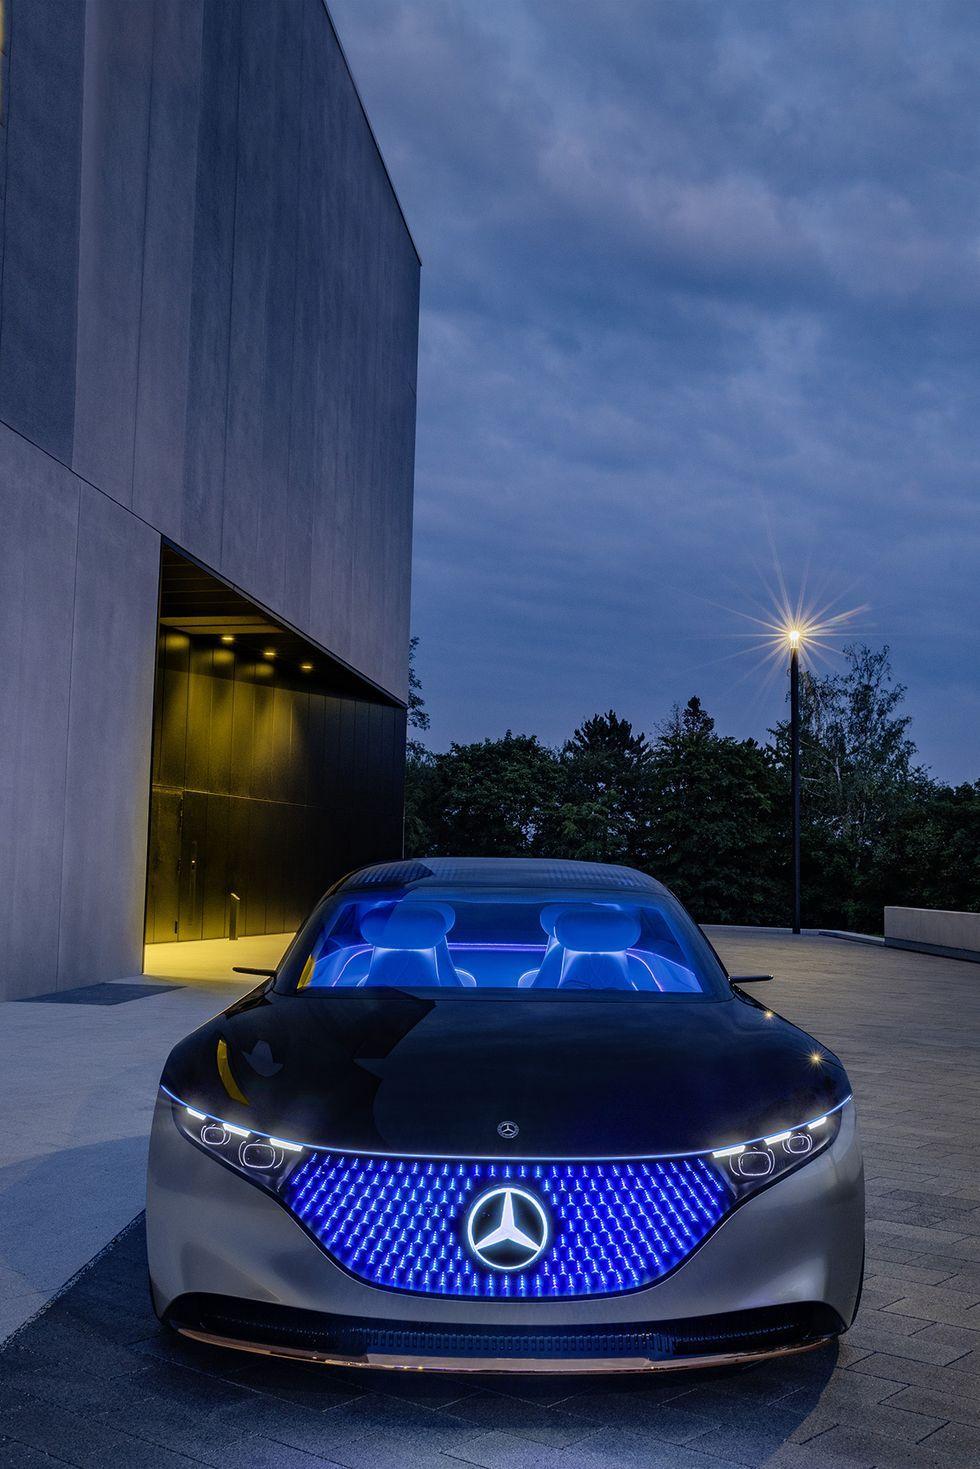 The 8 Best Luxury Cars Under 40k You Heard Us 40k Cars Heard Luxury Luks Arabalar